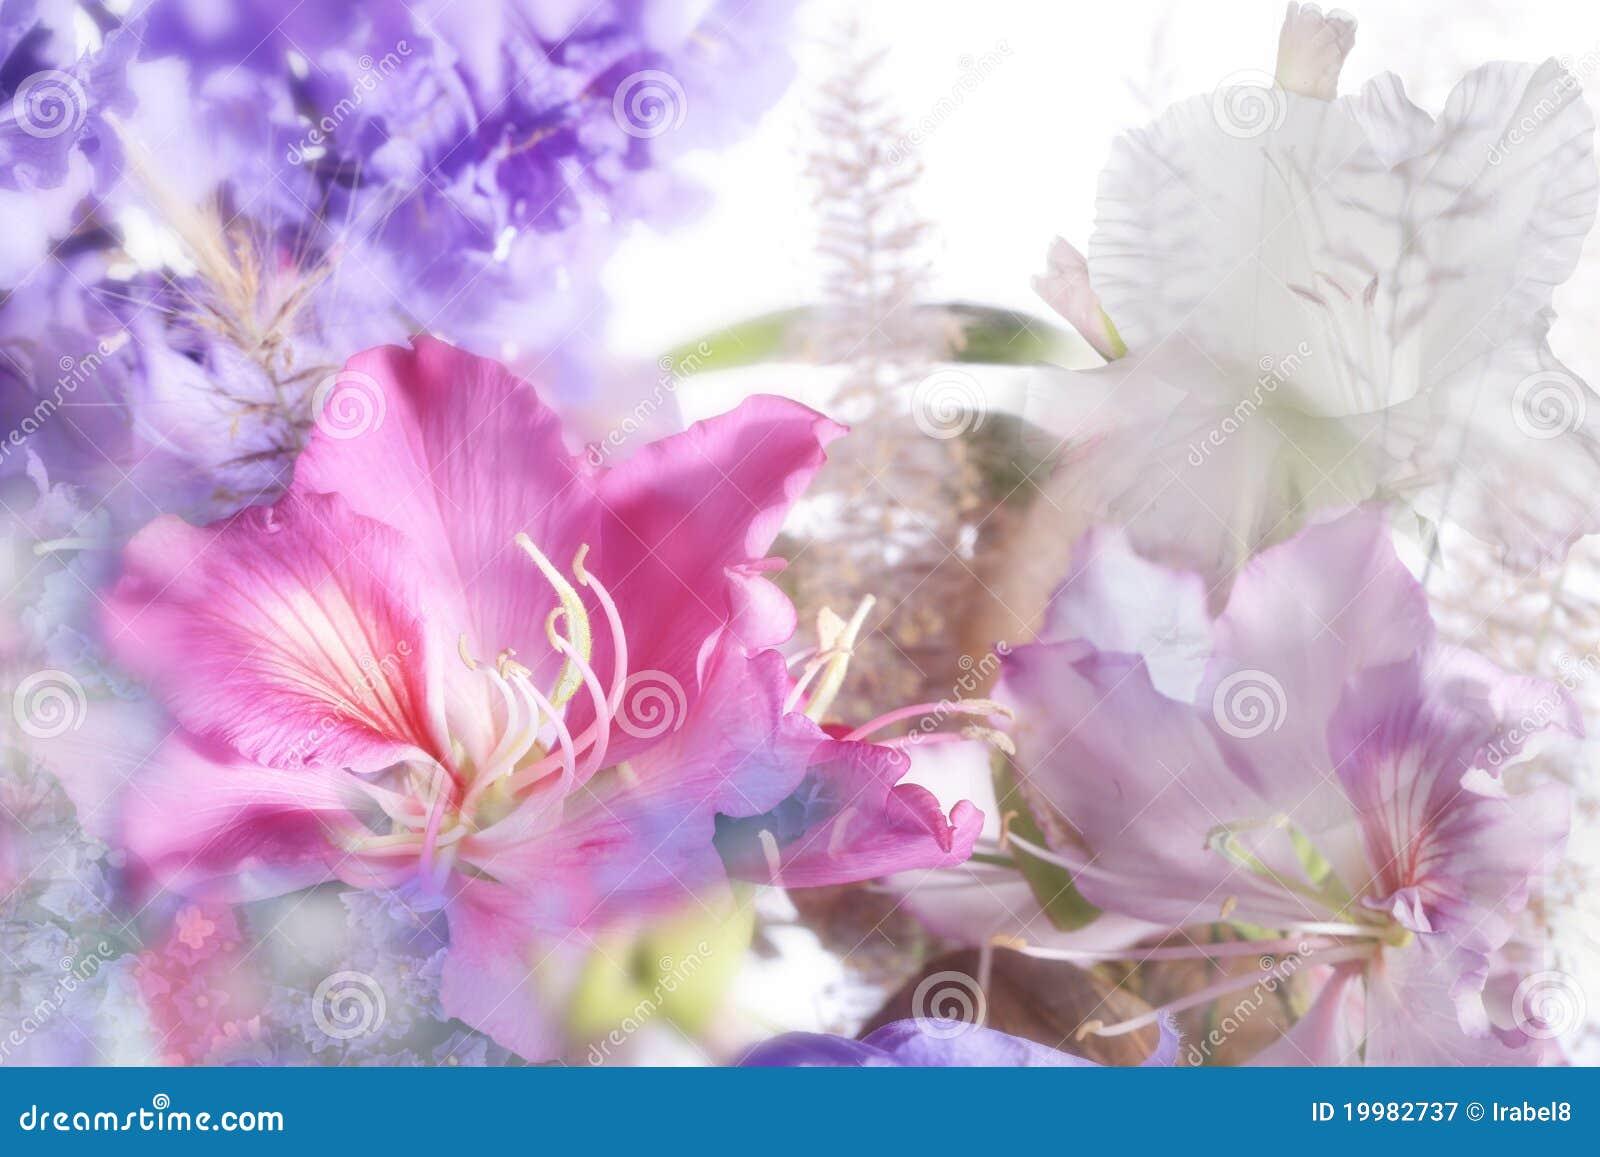 Beautiful exotic flowers stock image image of mood concept 19982737 beautiful exotic flowers izmirmasajfo